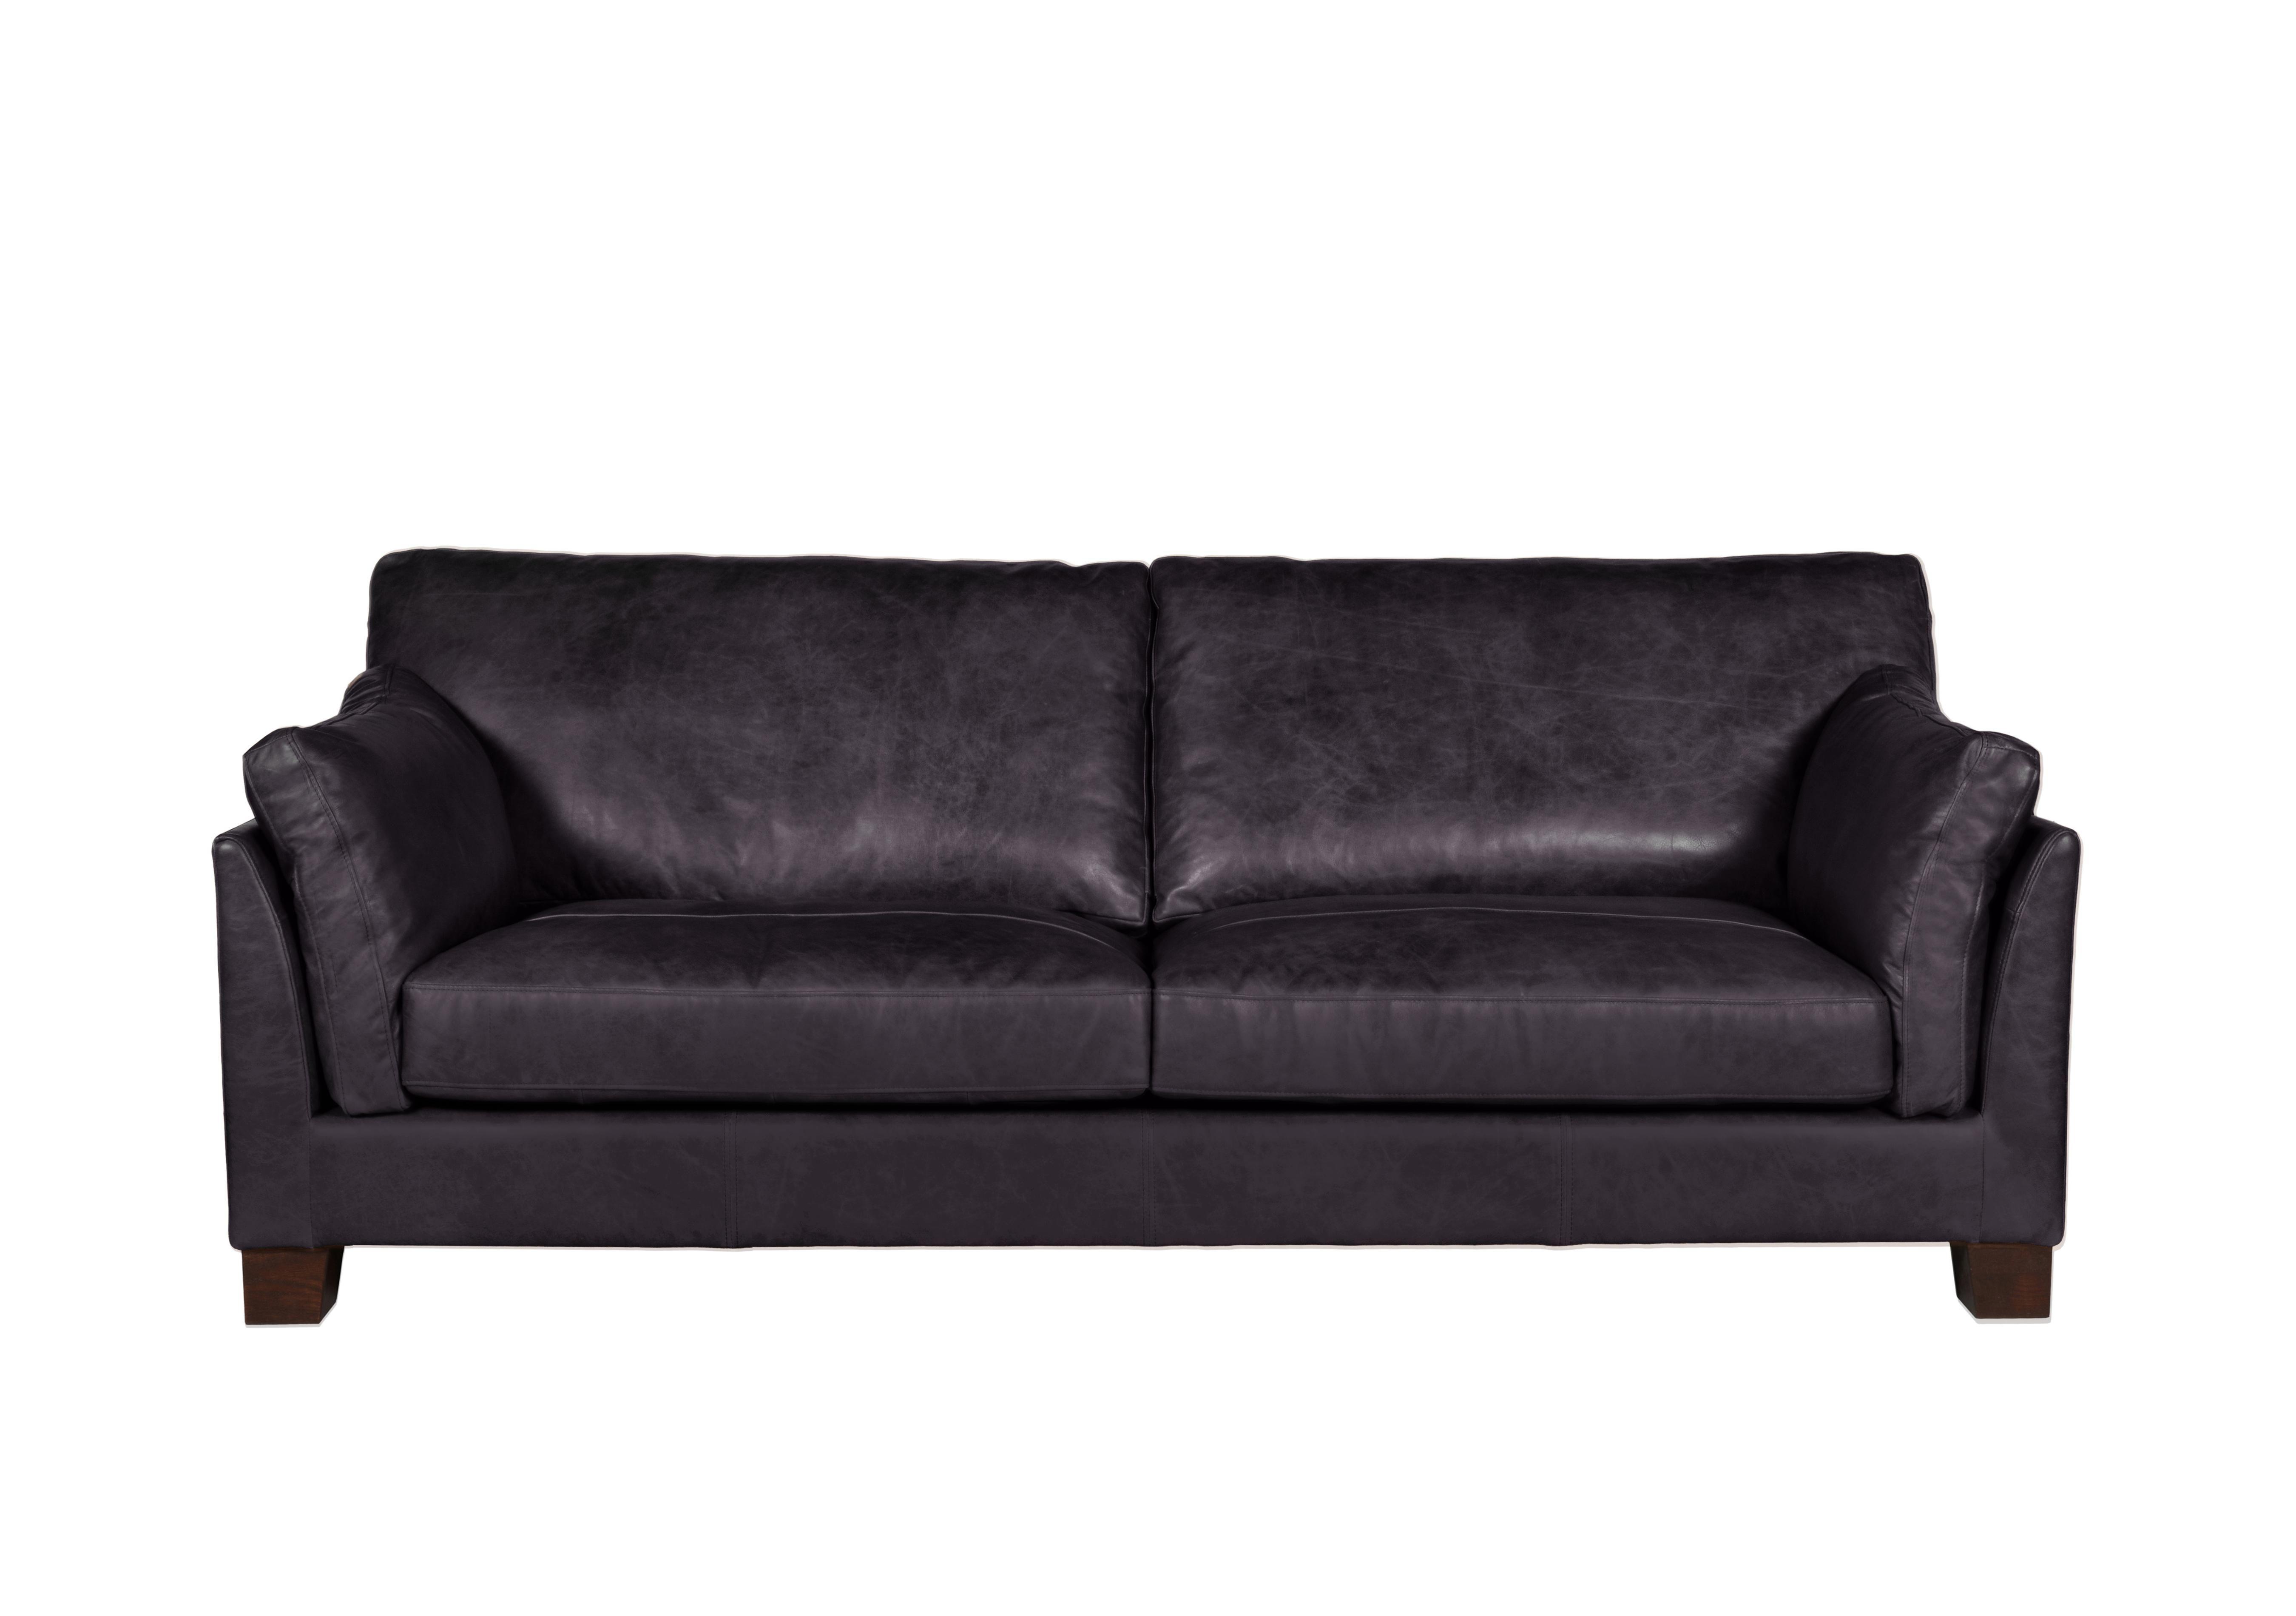 Halcyon Leather Sofa Furniture Village Contemporary Leather Sofa Grey Leather Sofa Leather Sofa